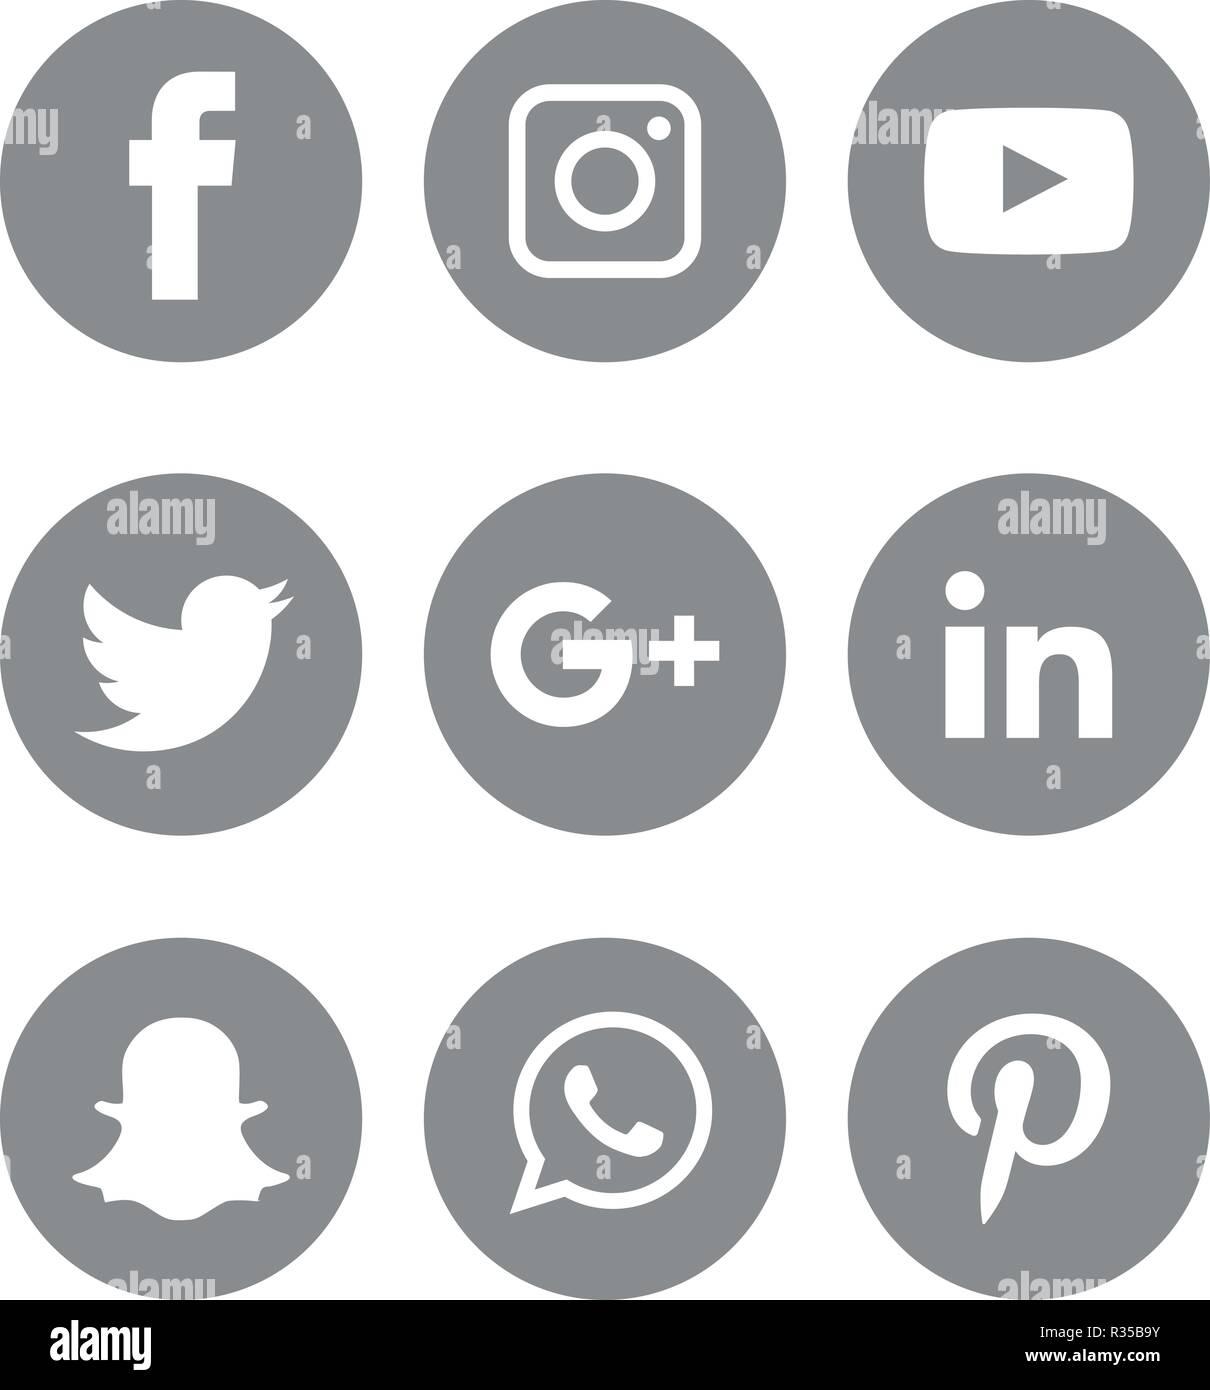 Social Media Icons Set Logo Vector Illustrator Facebook Instagram Twitter Whatsapp Communication Google Plus Device Youtube Smart Phone Net Stock Vector Image Art Alamy